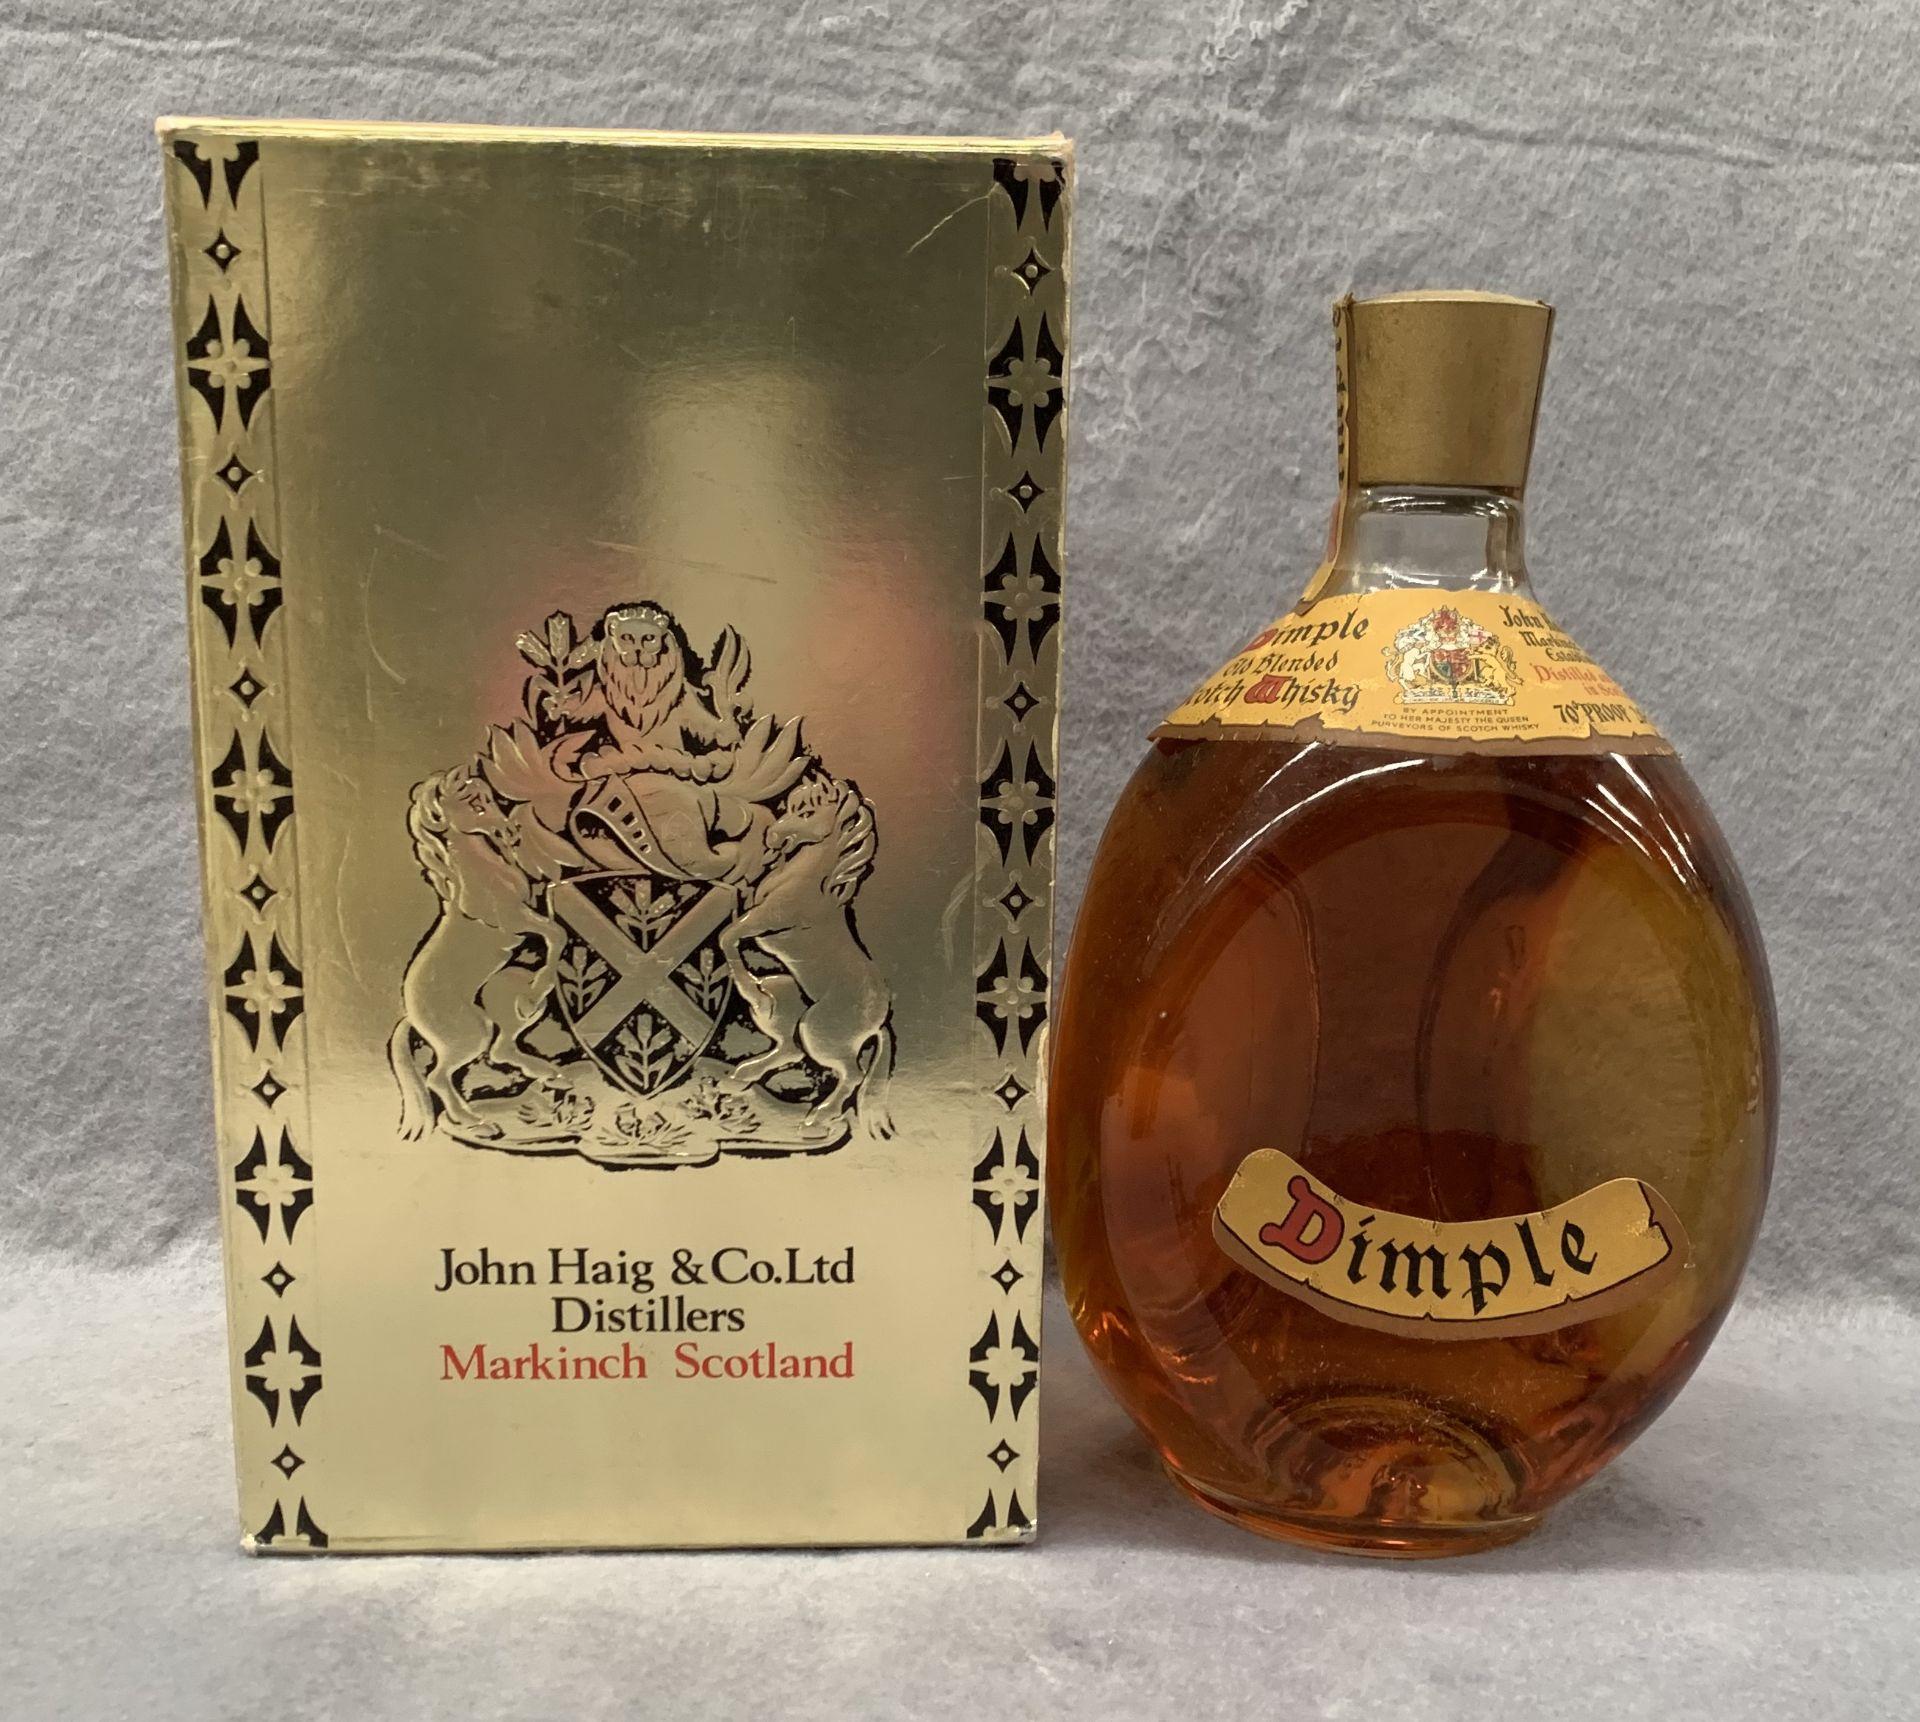 Lot 12 - A John Haig & Co Ltd 26 2/3 fl oz bottle of Dimple Old Blended Scotch Whisky in presentation box